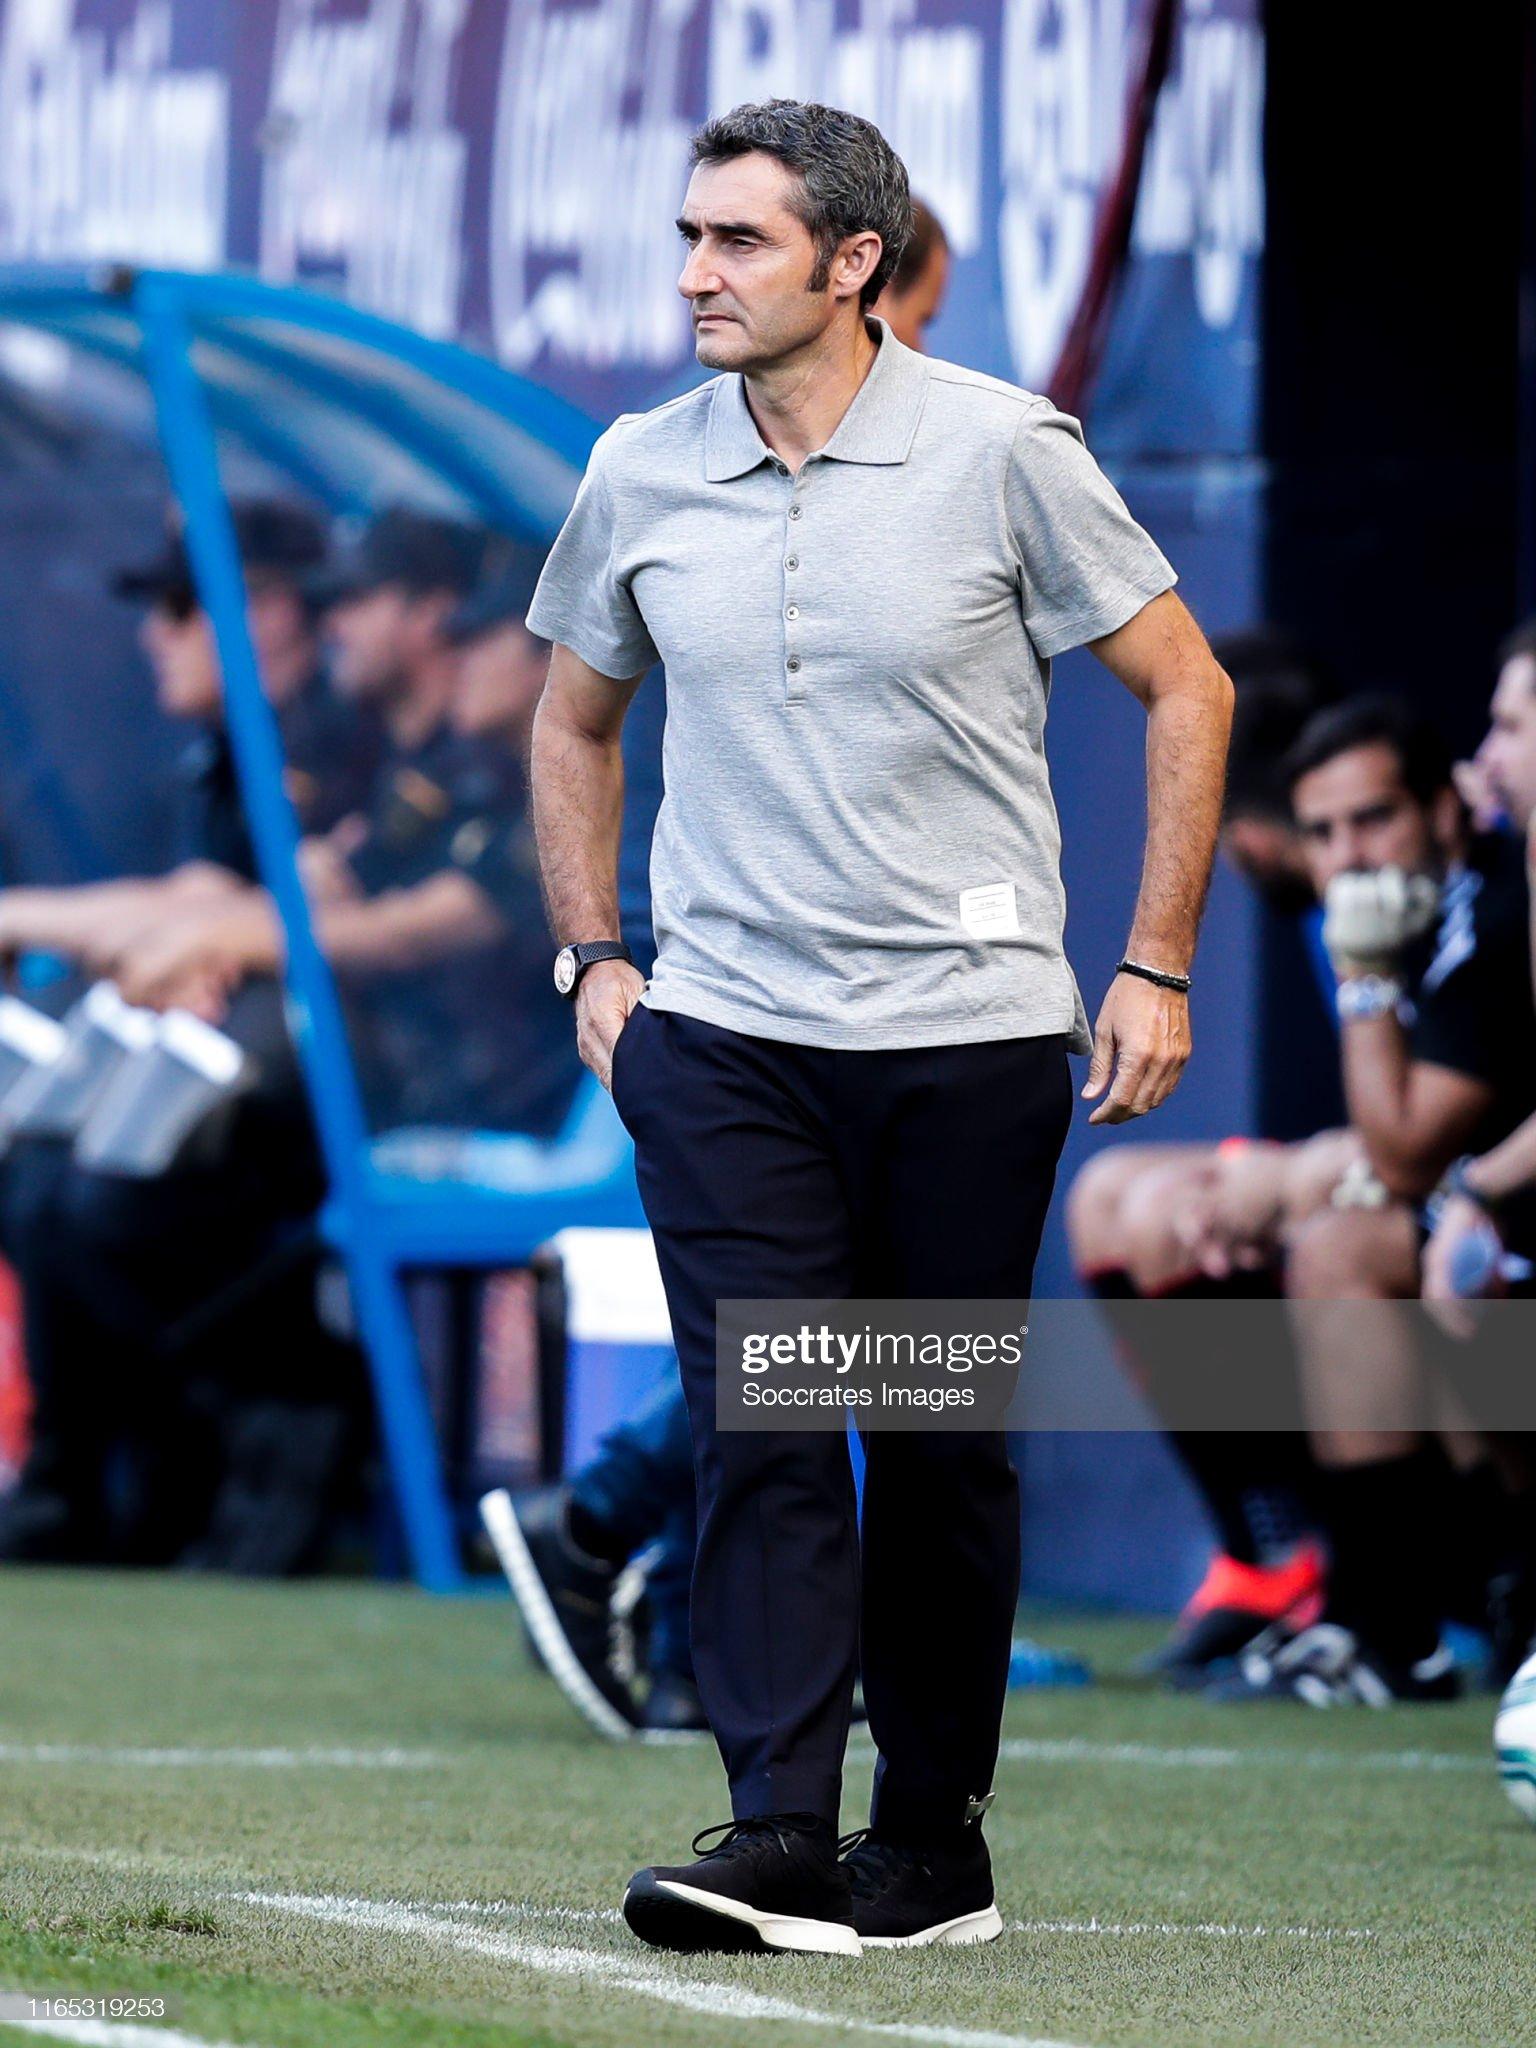 صور مباراة : أوساسونا - برشلونة 2-2 ( 31-08-2019 )  Coach-ernesto-valverde-of-fc-barcelona-during-the-la-liga-santander-picture-id1165319253?s=2048x2048